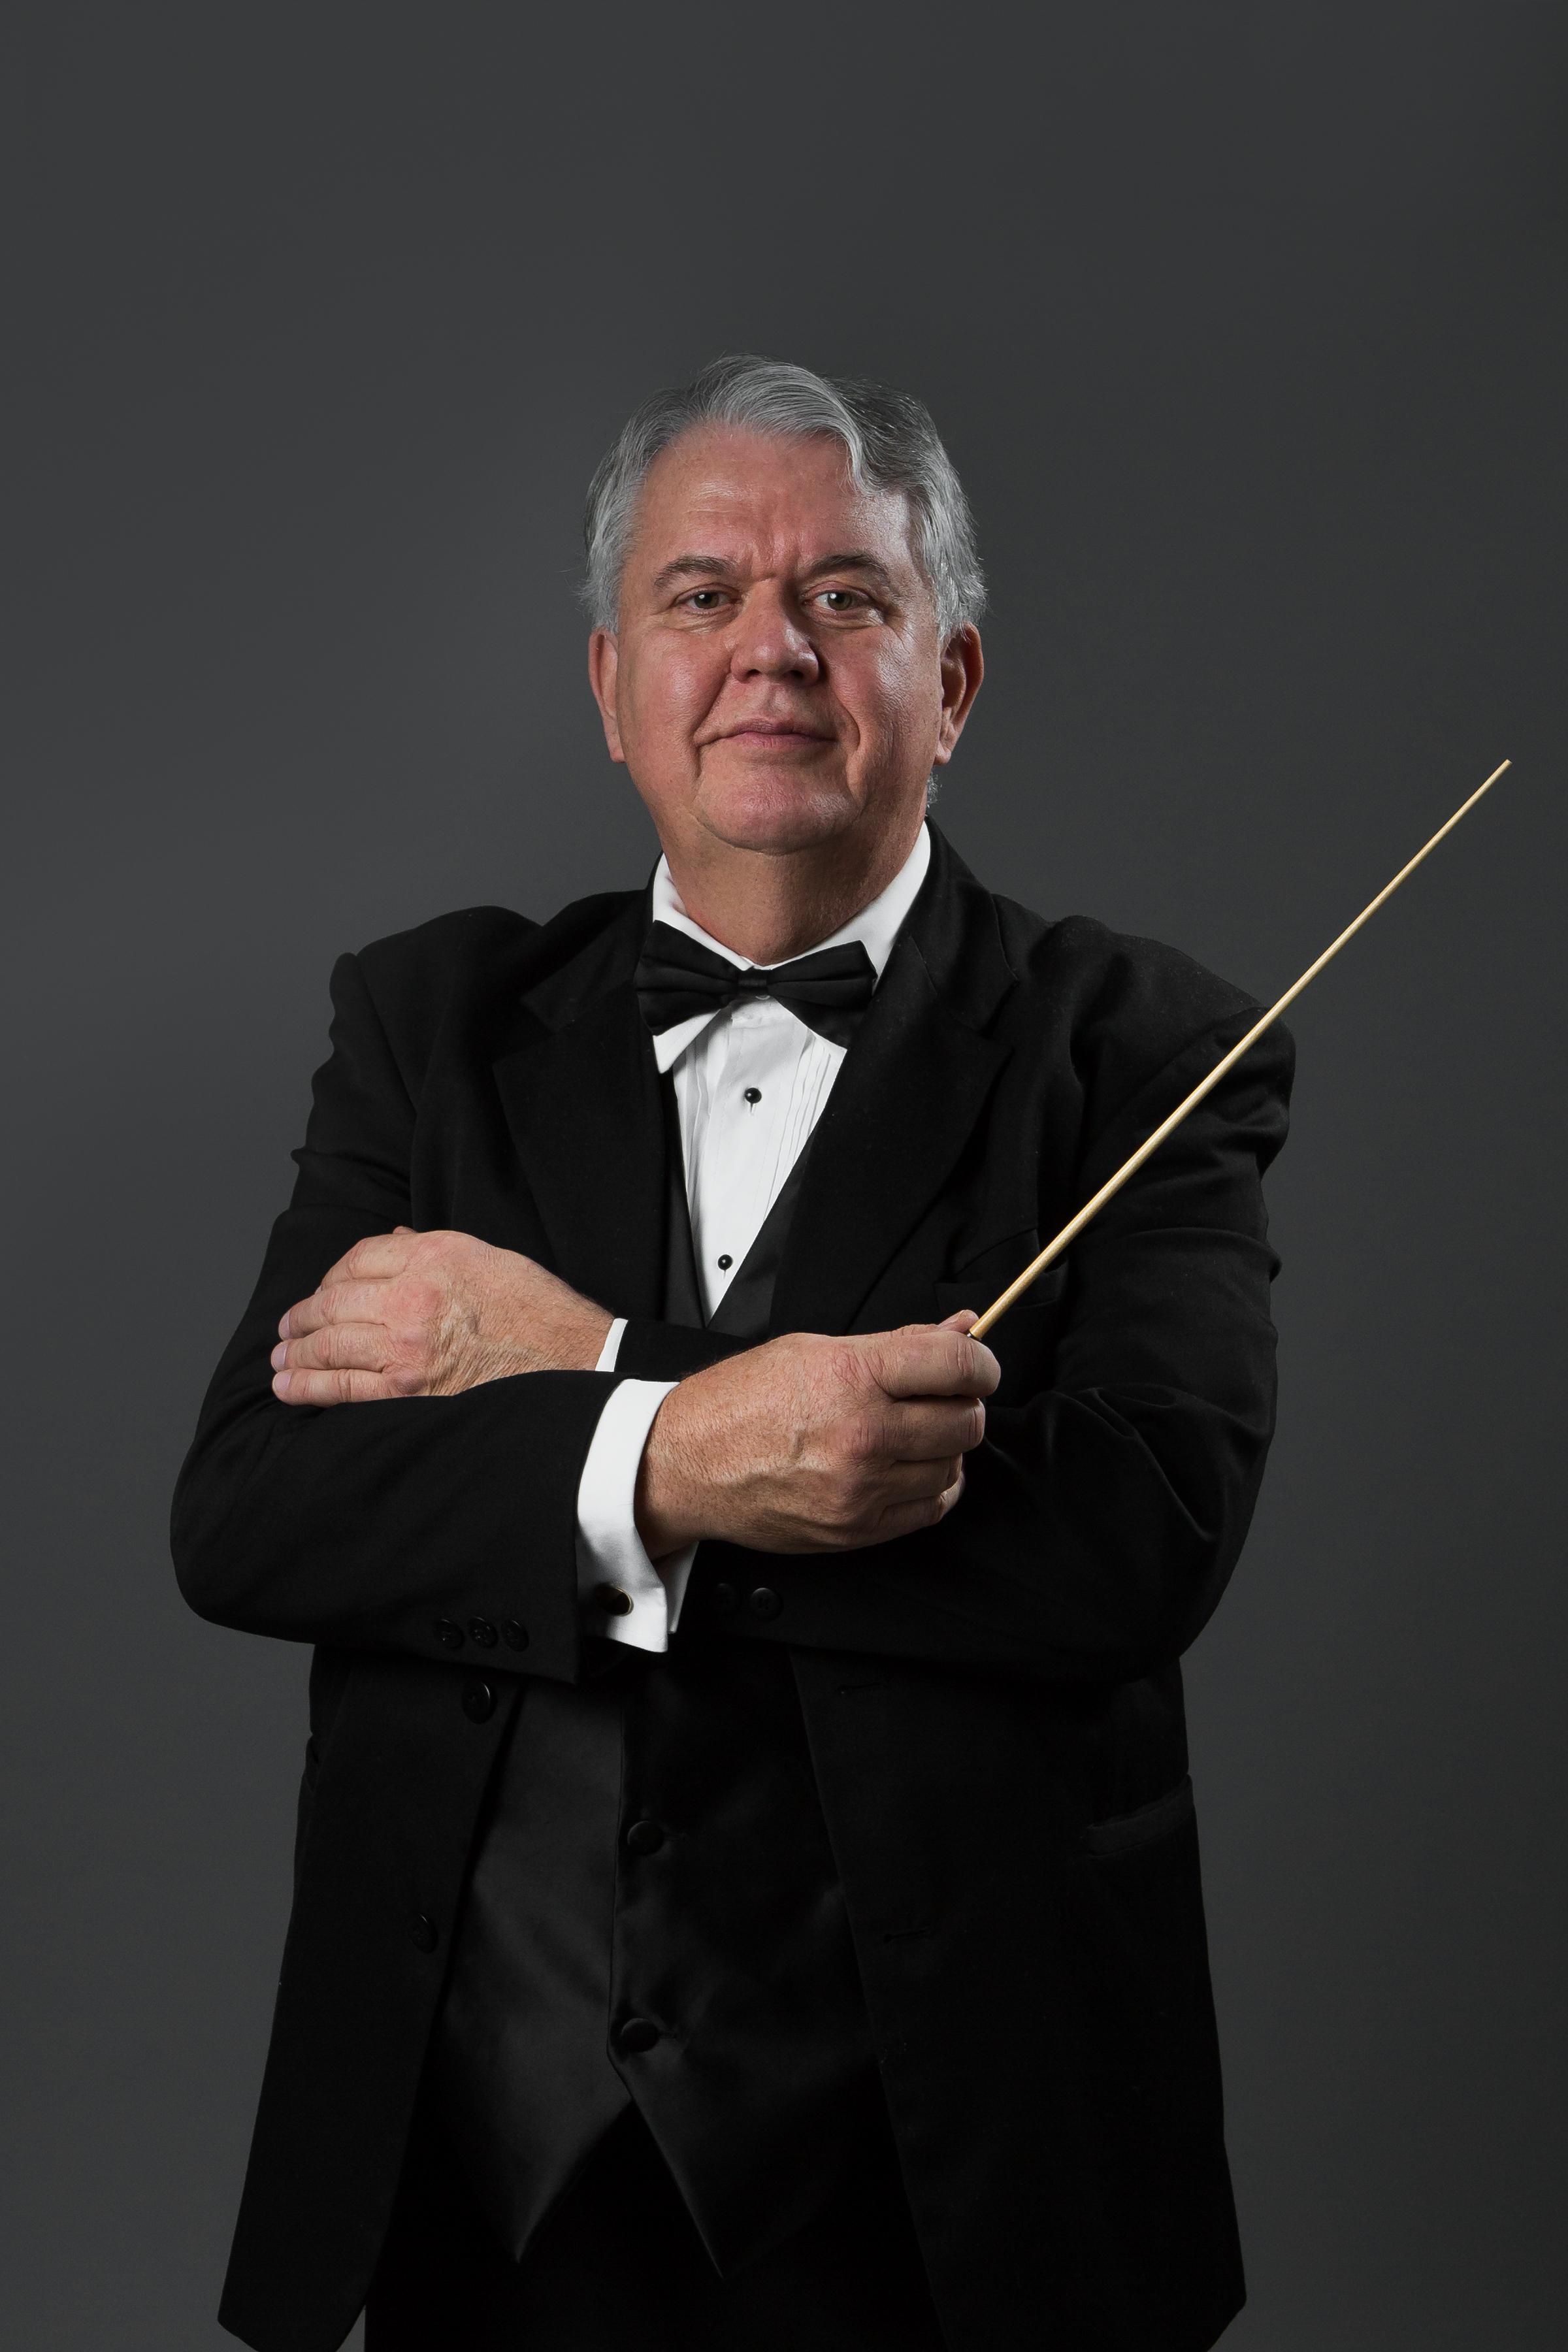 Conductor_Baton_Headshot